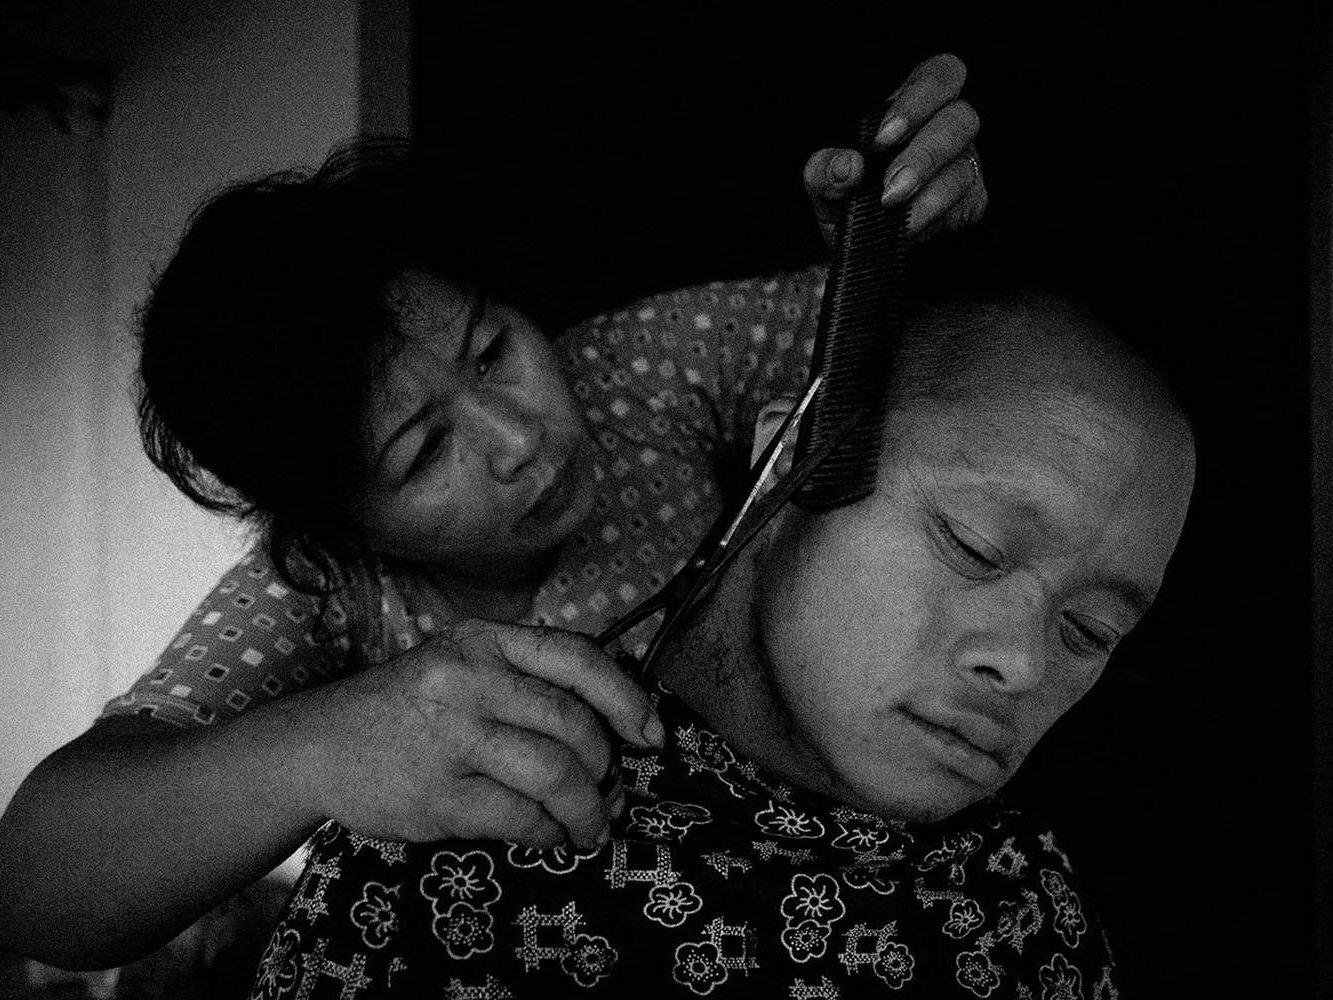 vietnam photographer smallthings binhdang 9